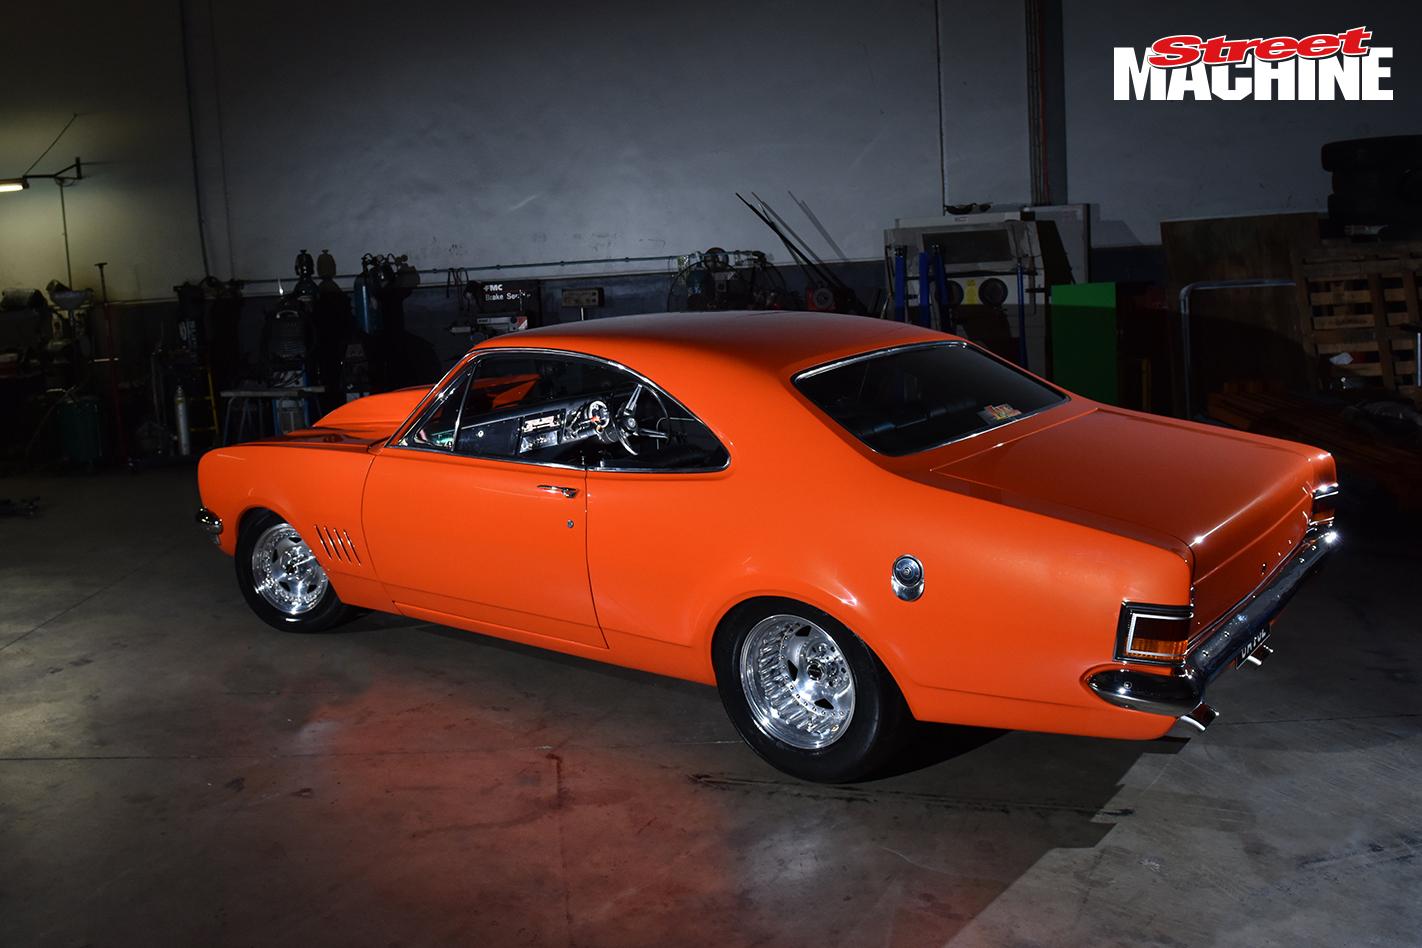 HG Holden Monaro 427 1 Nw